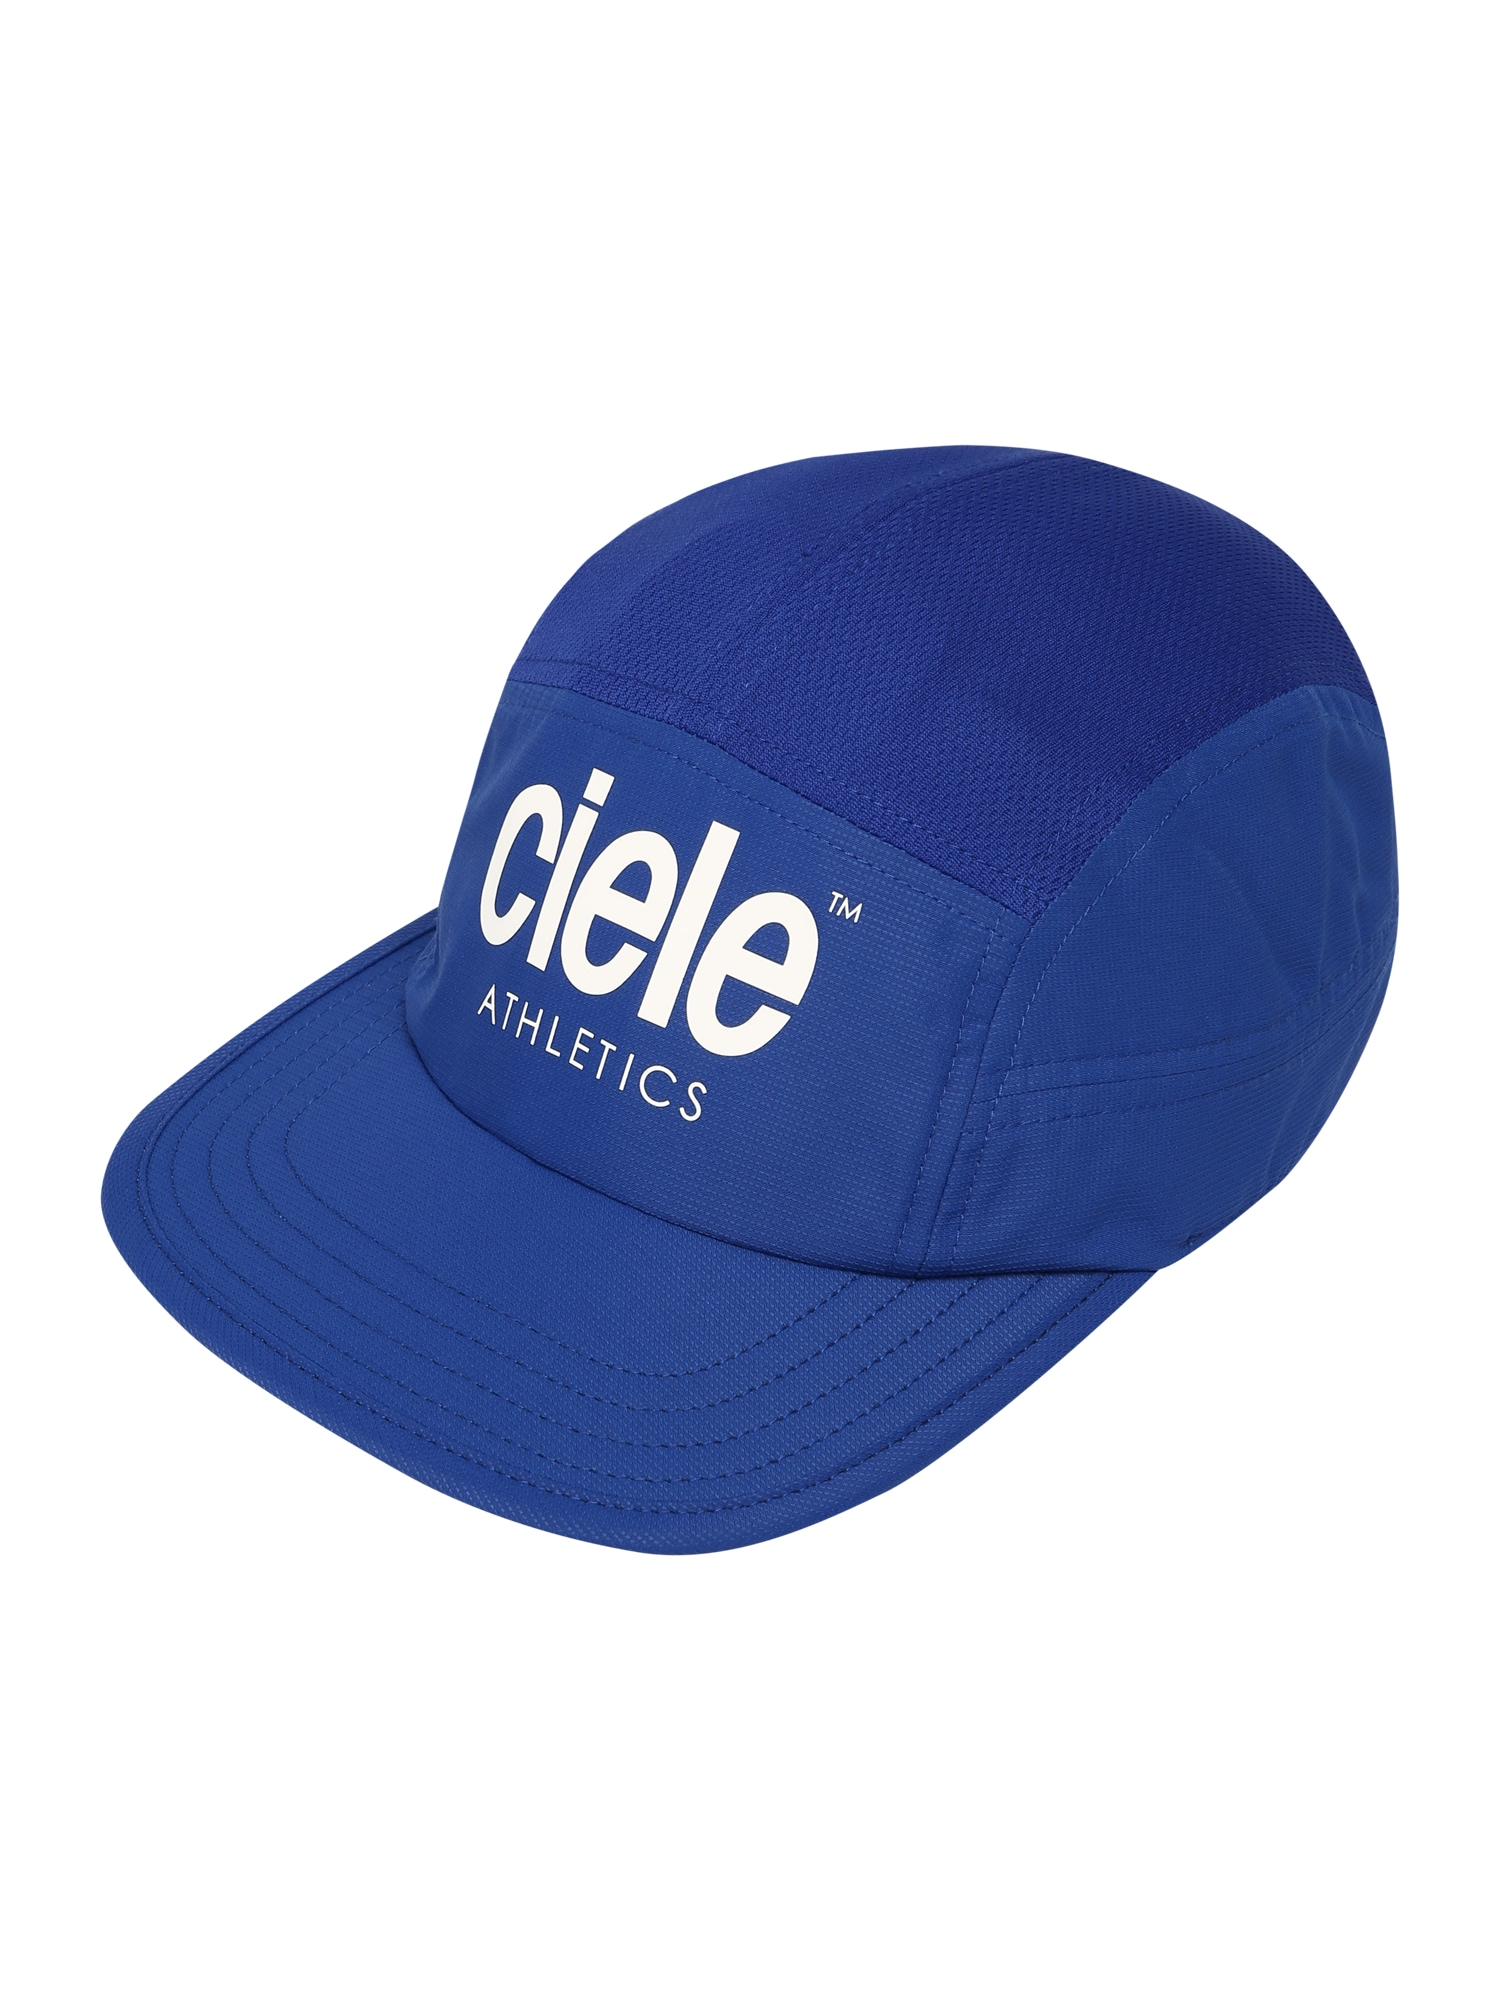 CIELE ATHLETICS Kepurė tamsiai mėlyna / balta